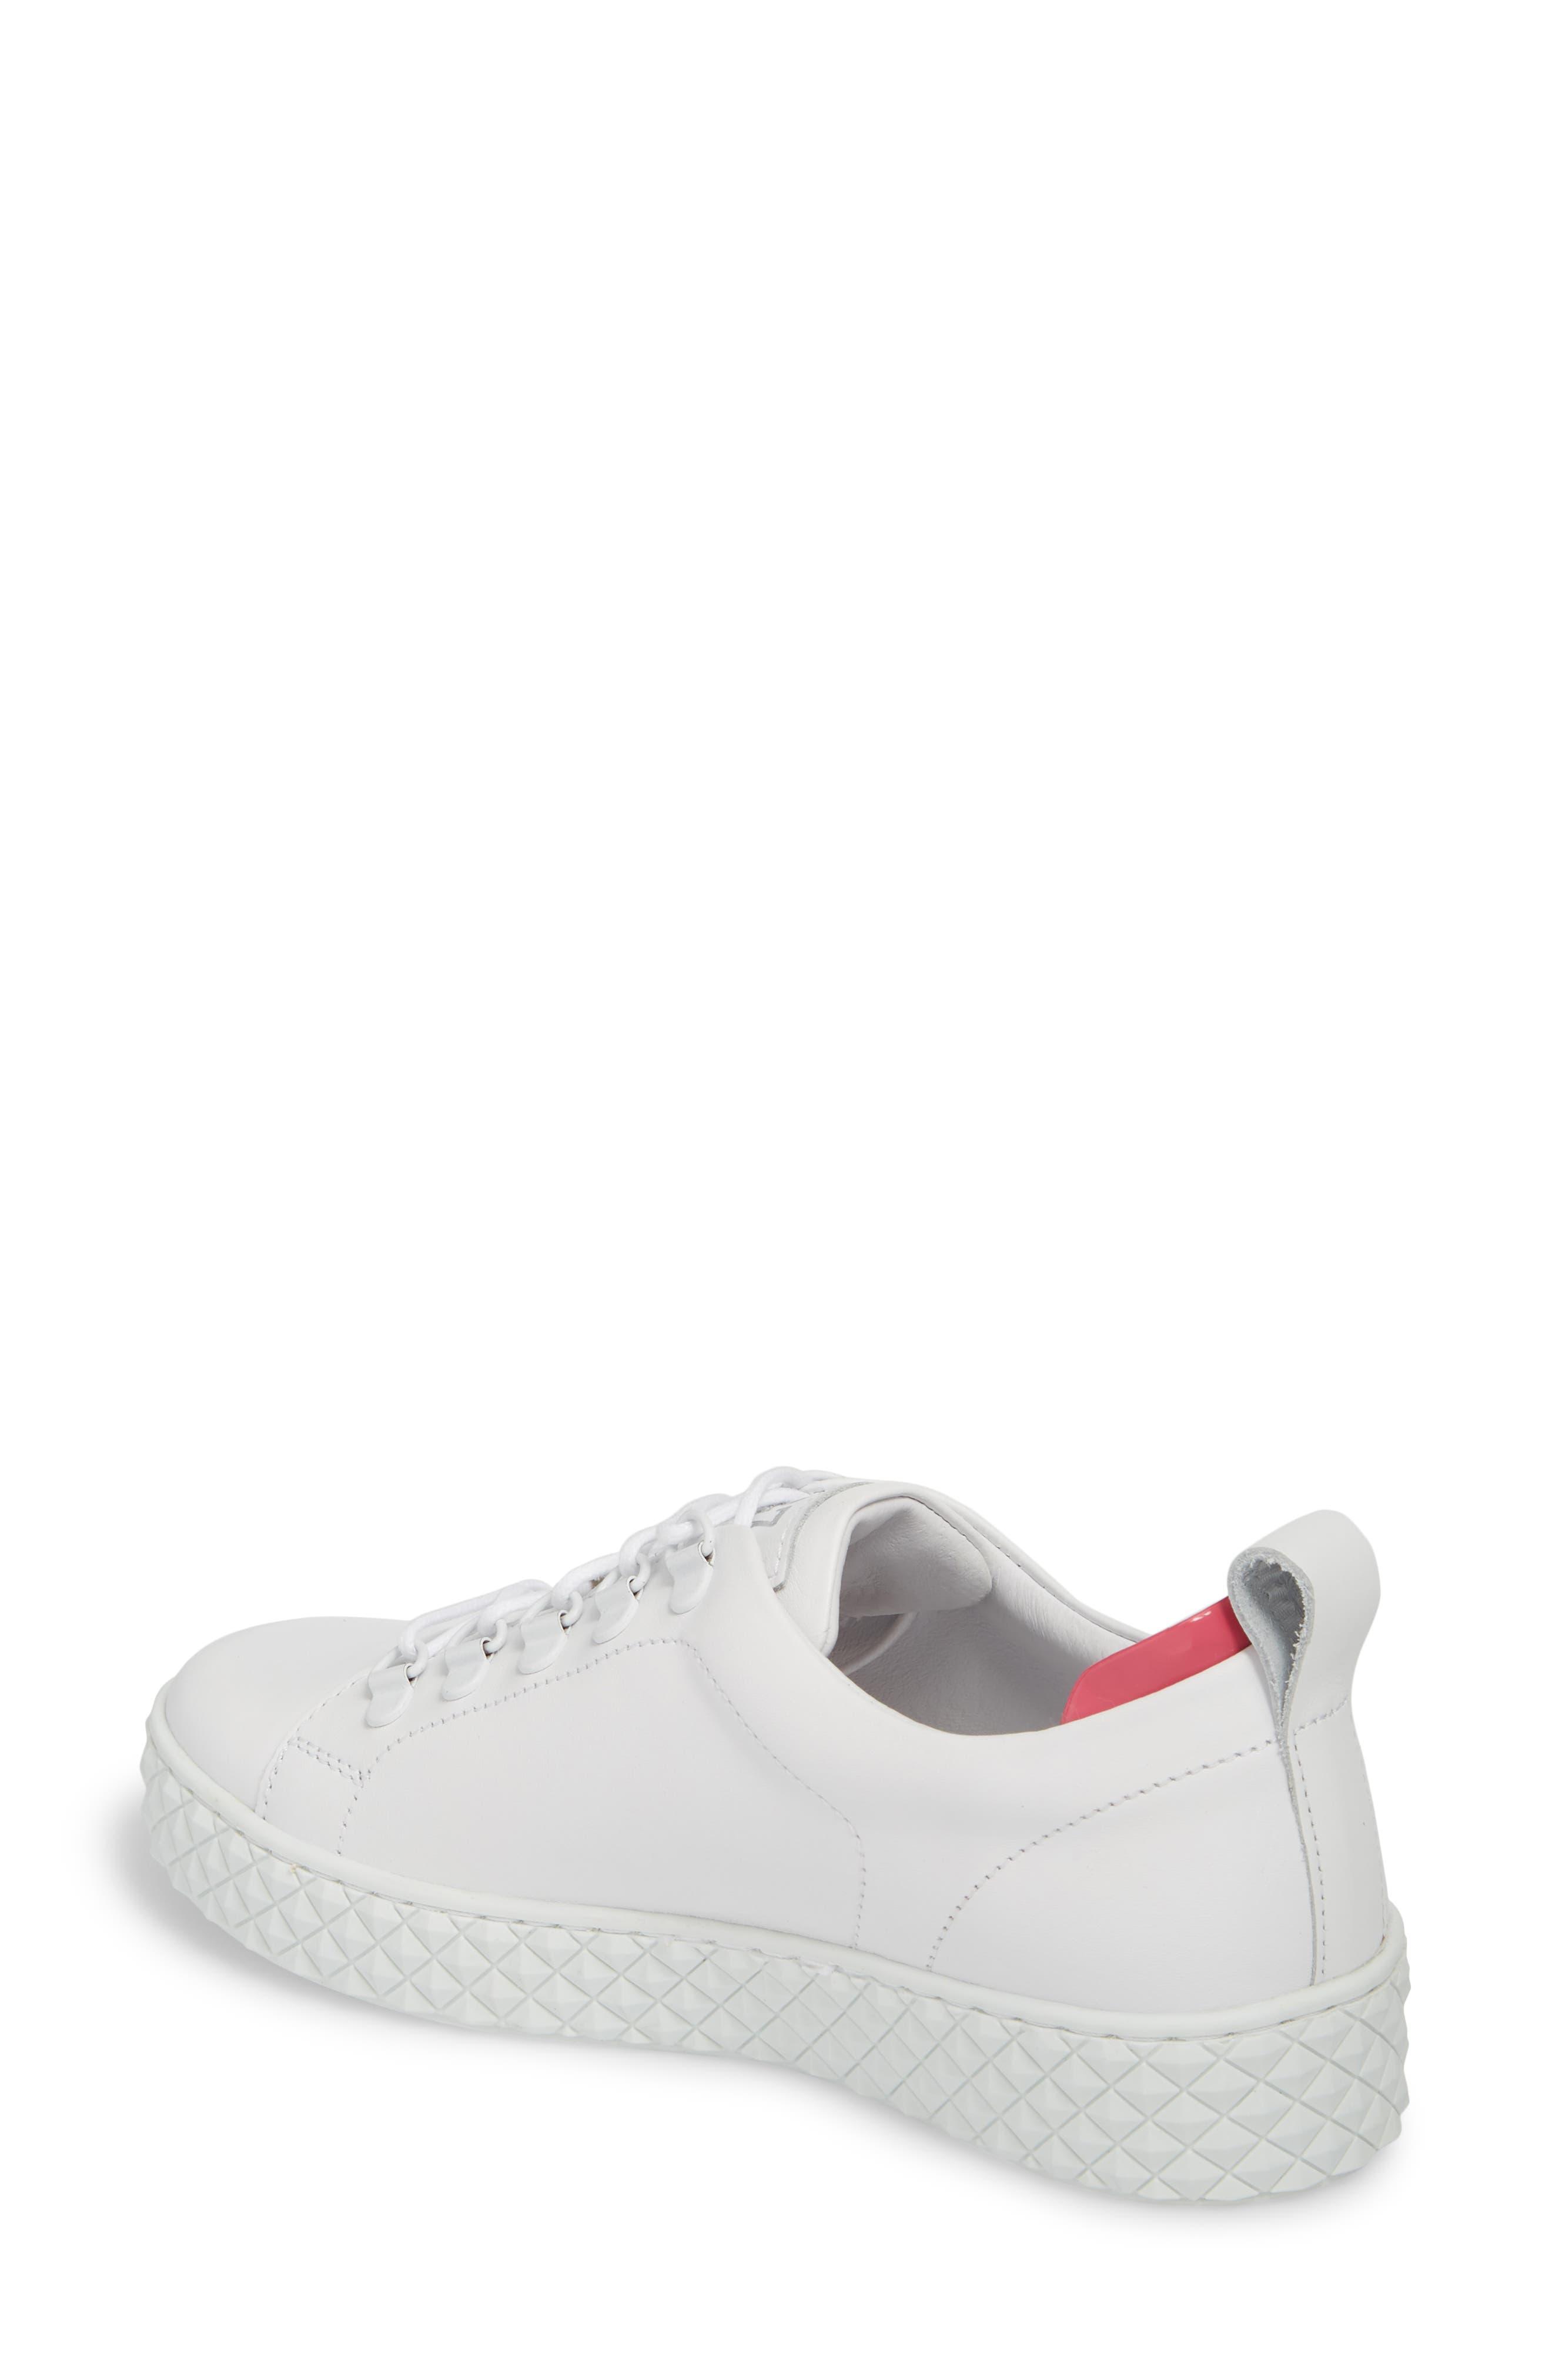 Sol Sneaker,                             Alternate thumbnail 2, color,                             Optic White/ Fuchsia Leather